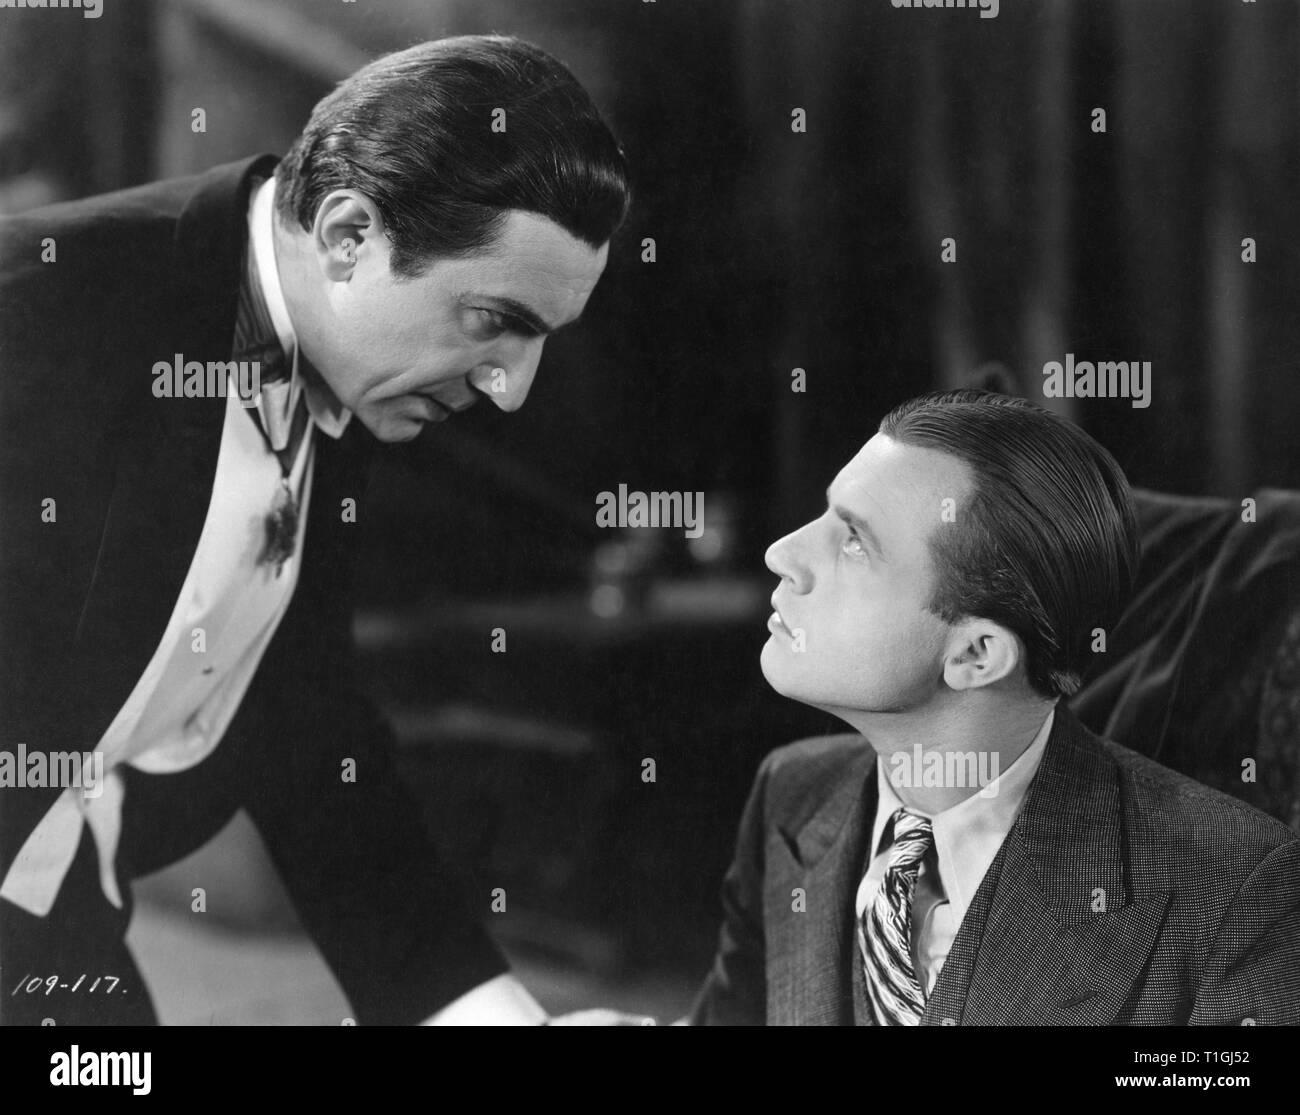 Bela Lugosi as Count Dracula Dwight Frye as Renfield DRACULA 1931 director Tod Browning novel Bram Stoker Universal Pictures - Stock Image